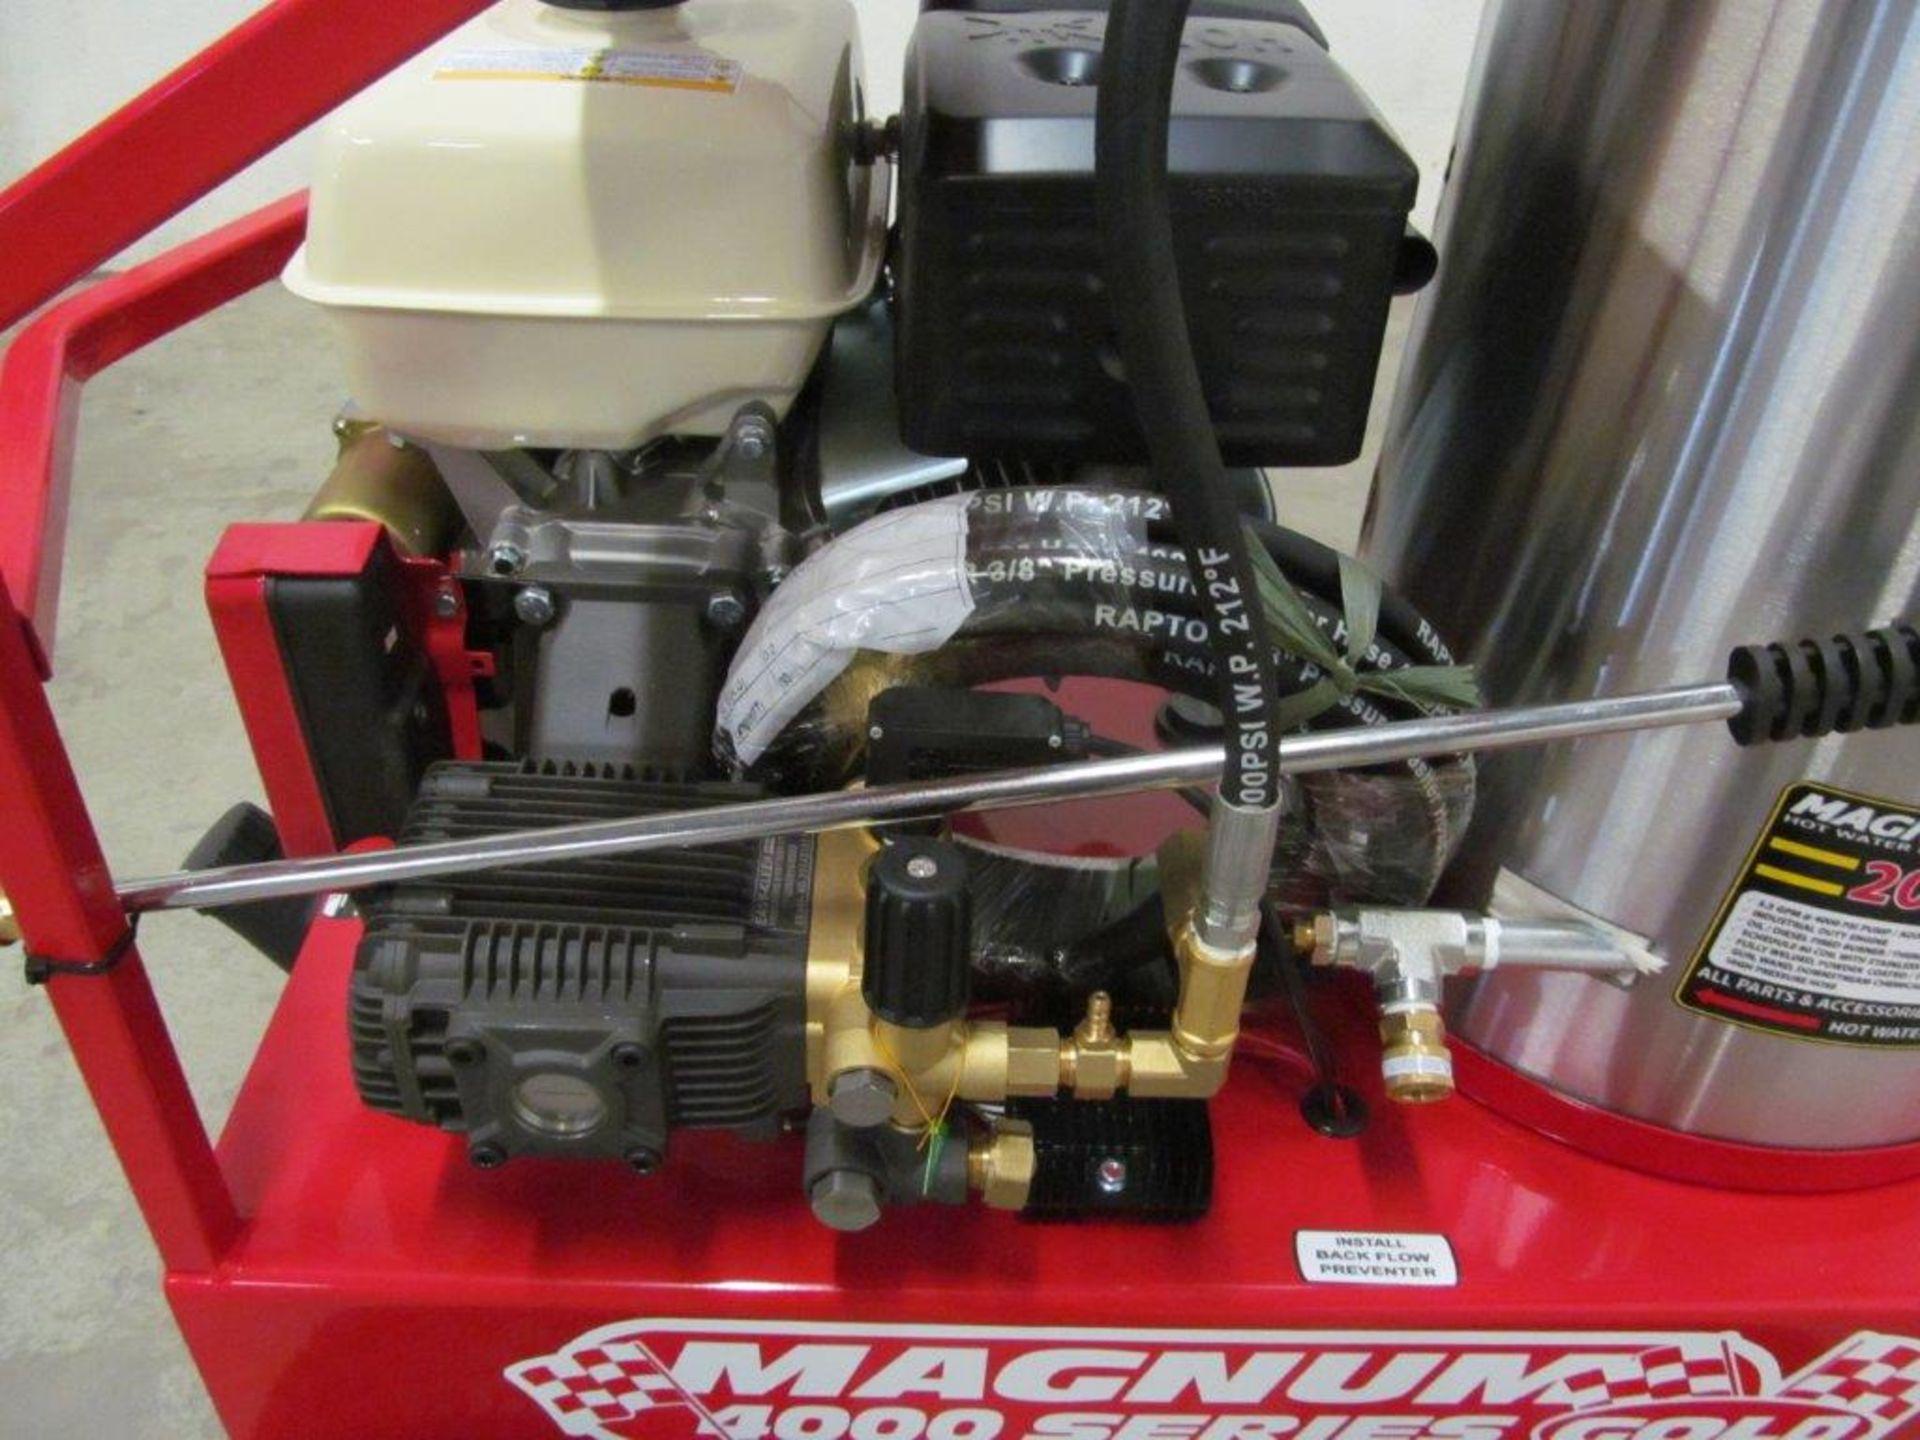 (NEW) EASY-KLEEN HOT WATER PRESSURE WASHER, MDL. MAGNUM GOLD, 15 HP ENGINE. DIESEL FIRED BURNER - Image 6 of 12